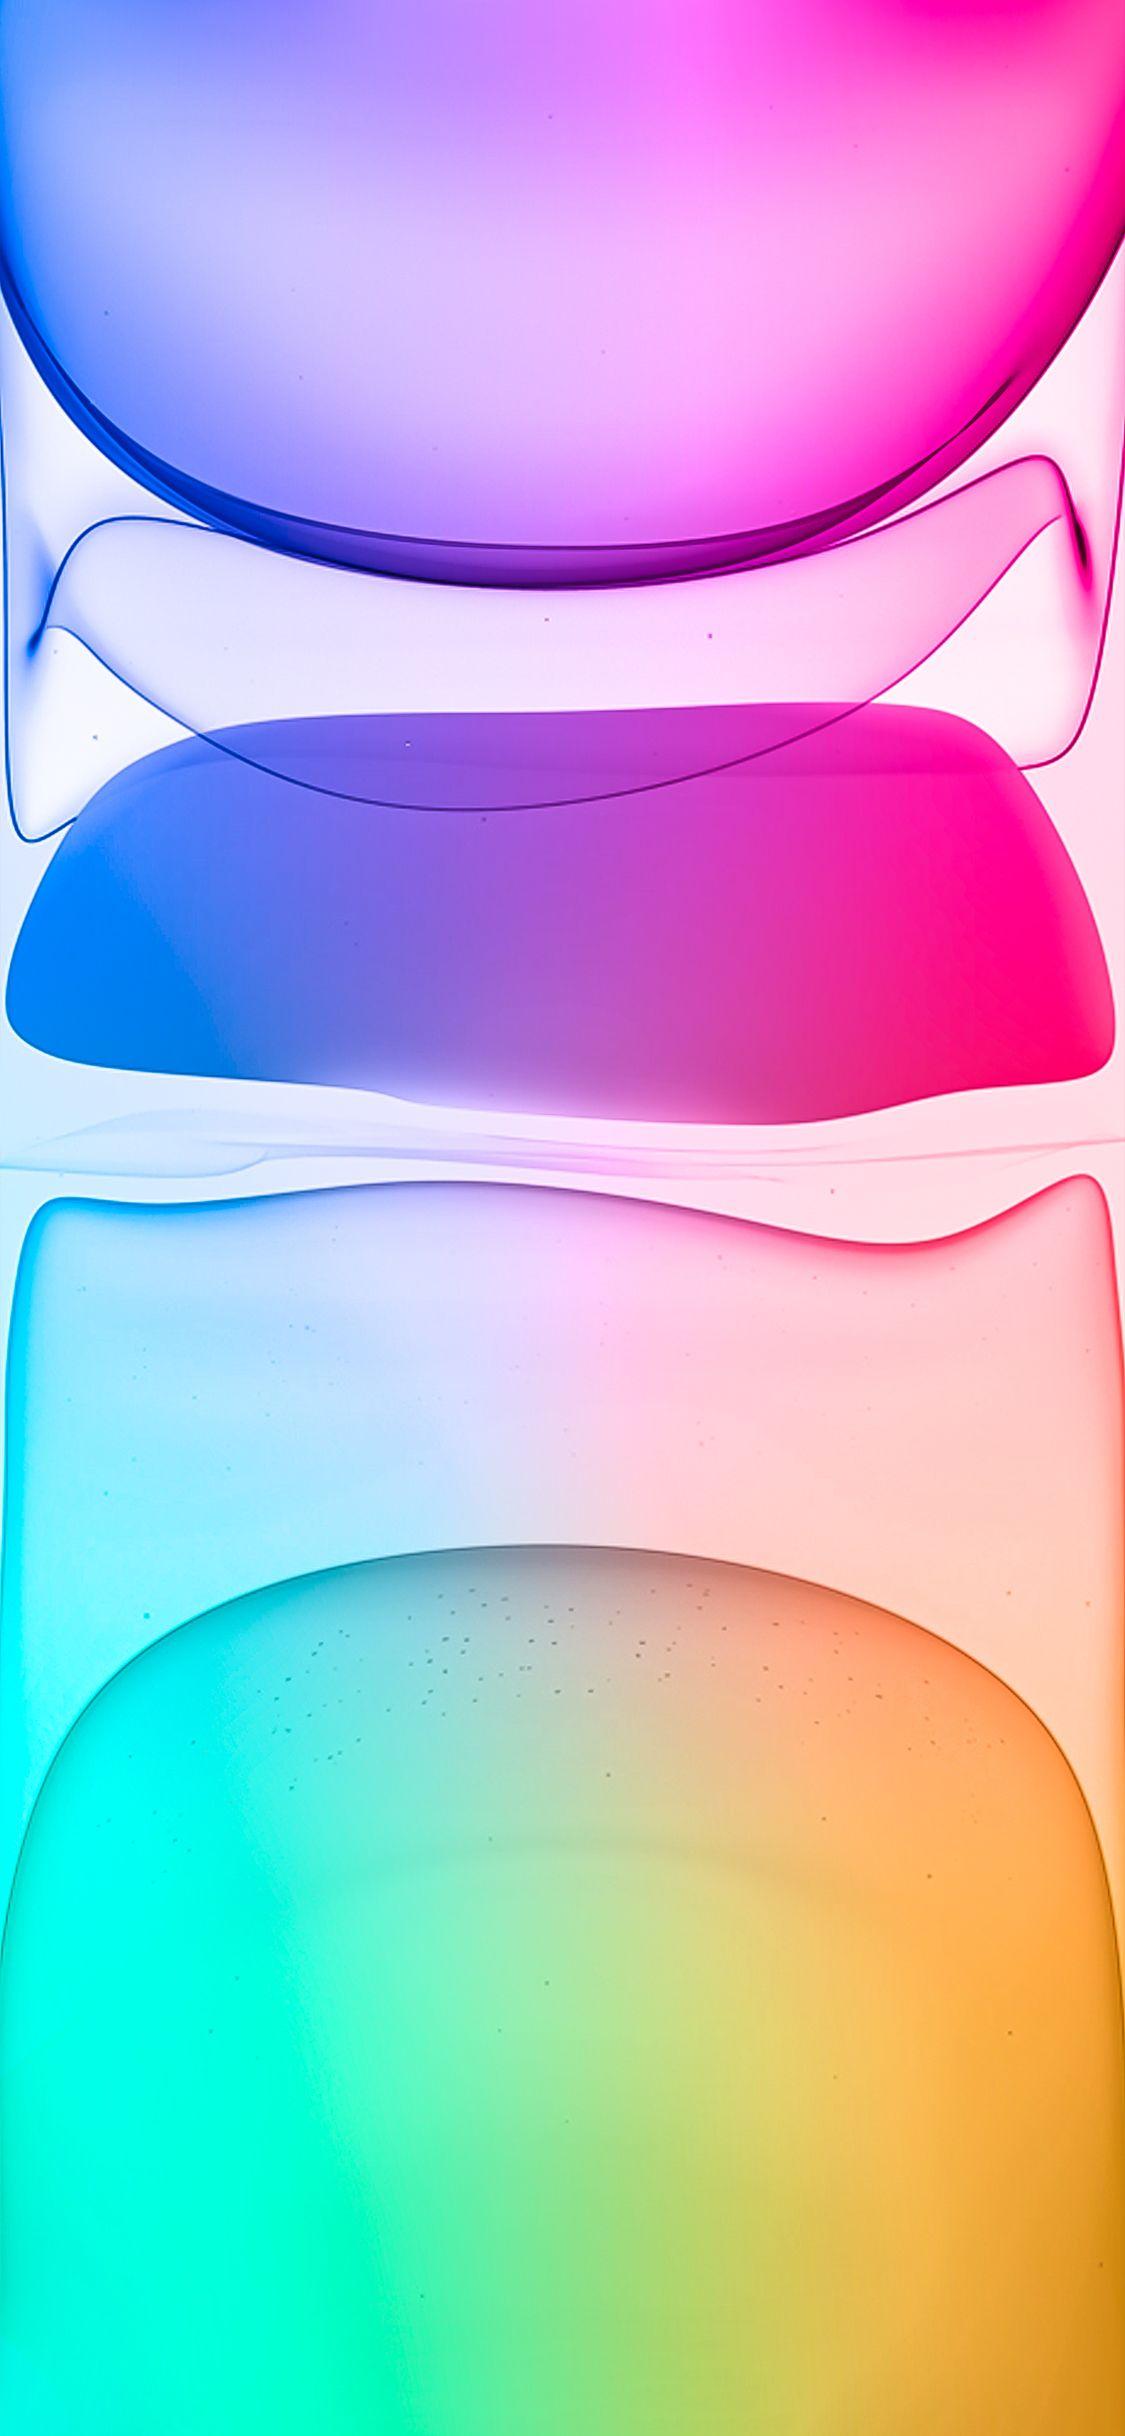 Iphone 11 Pro Max Apple Wallpaper Iphone Happy Wallpaper Apple